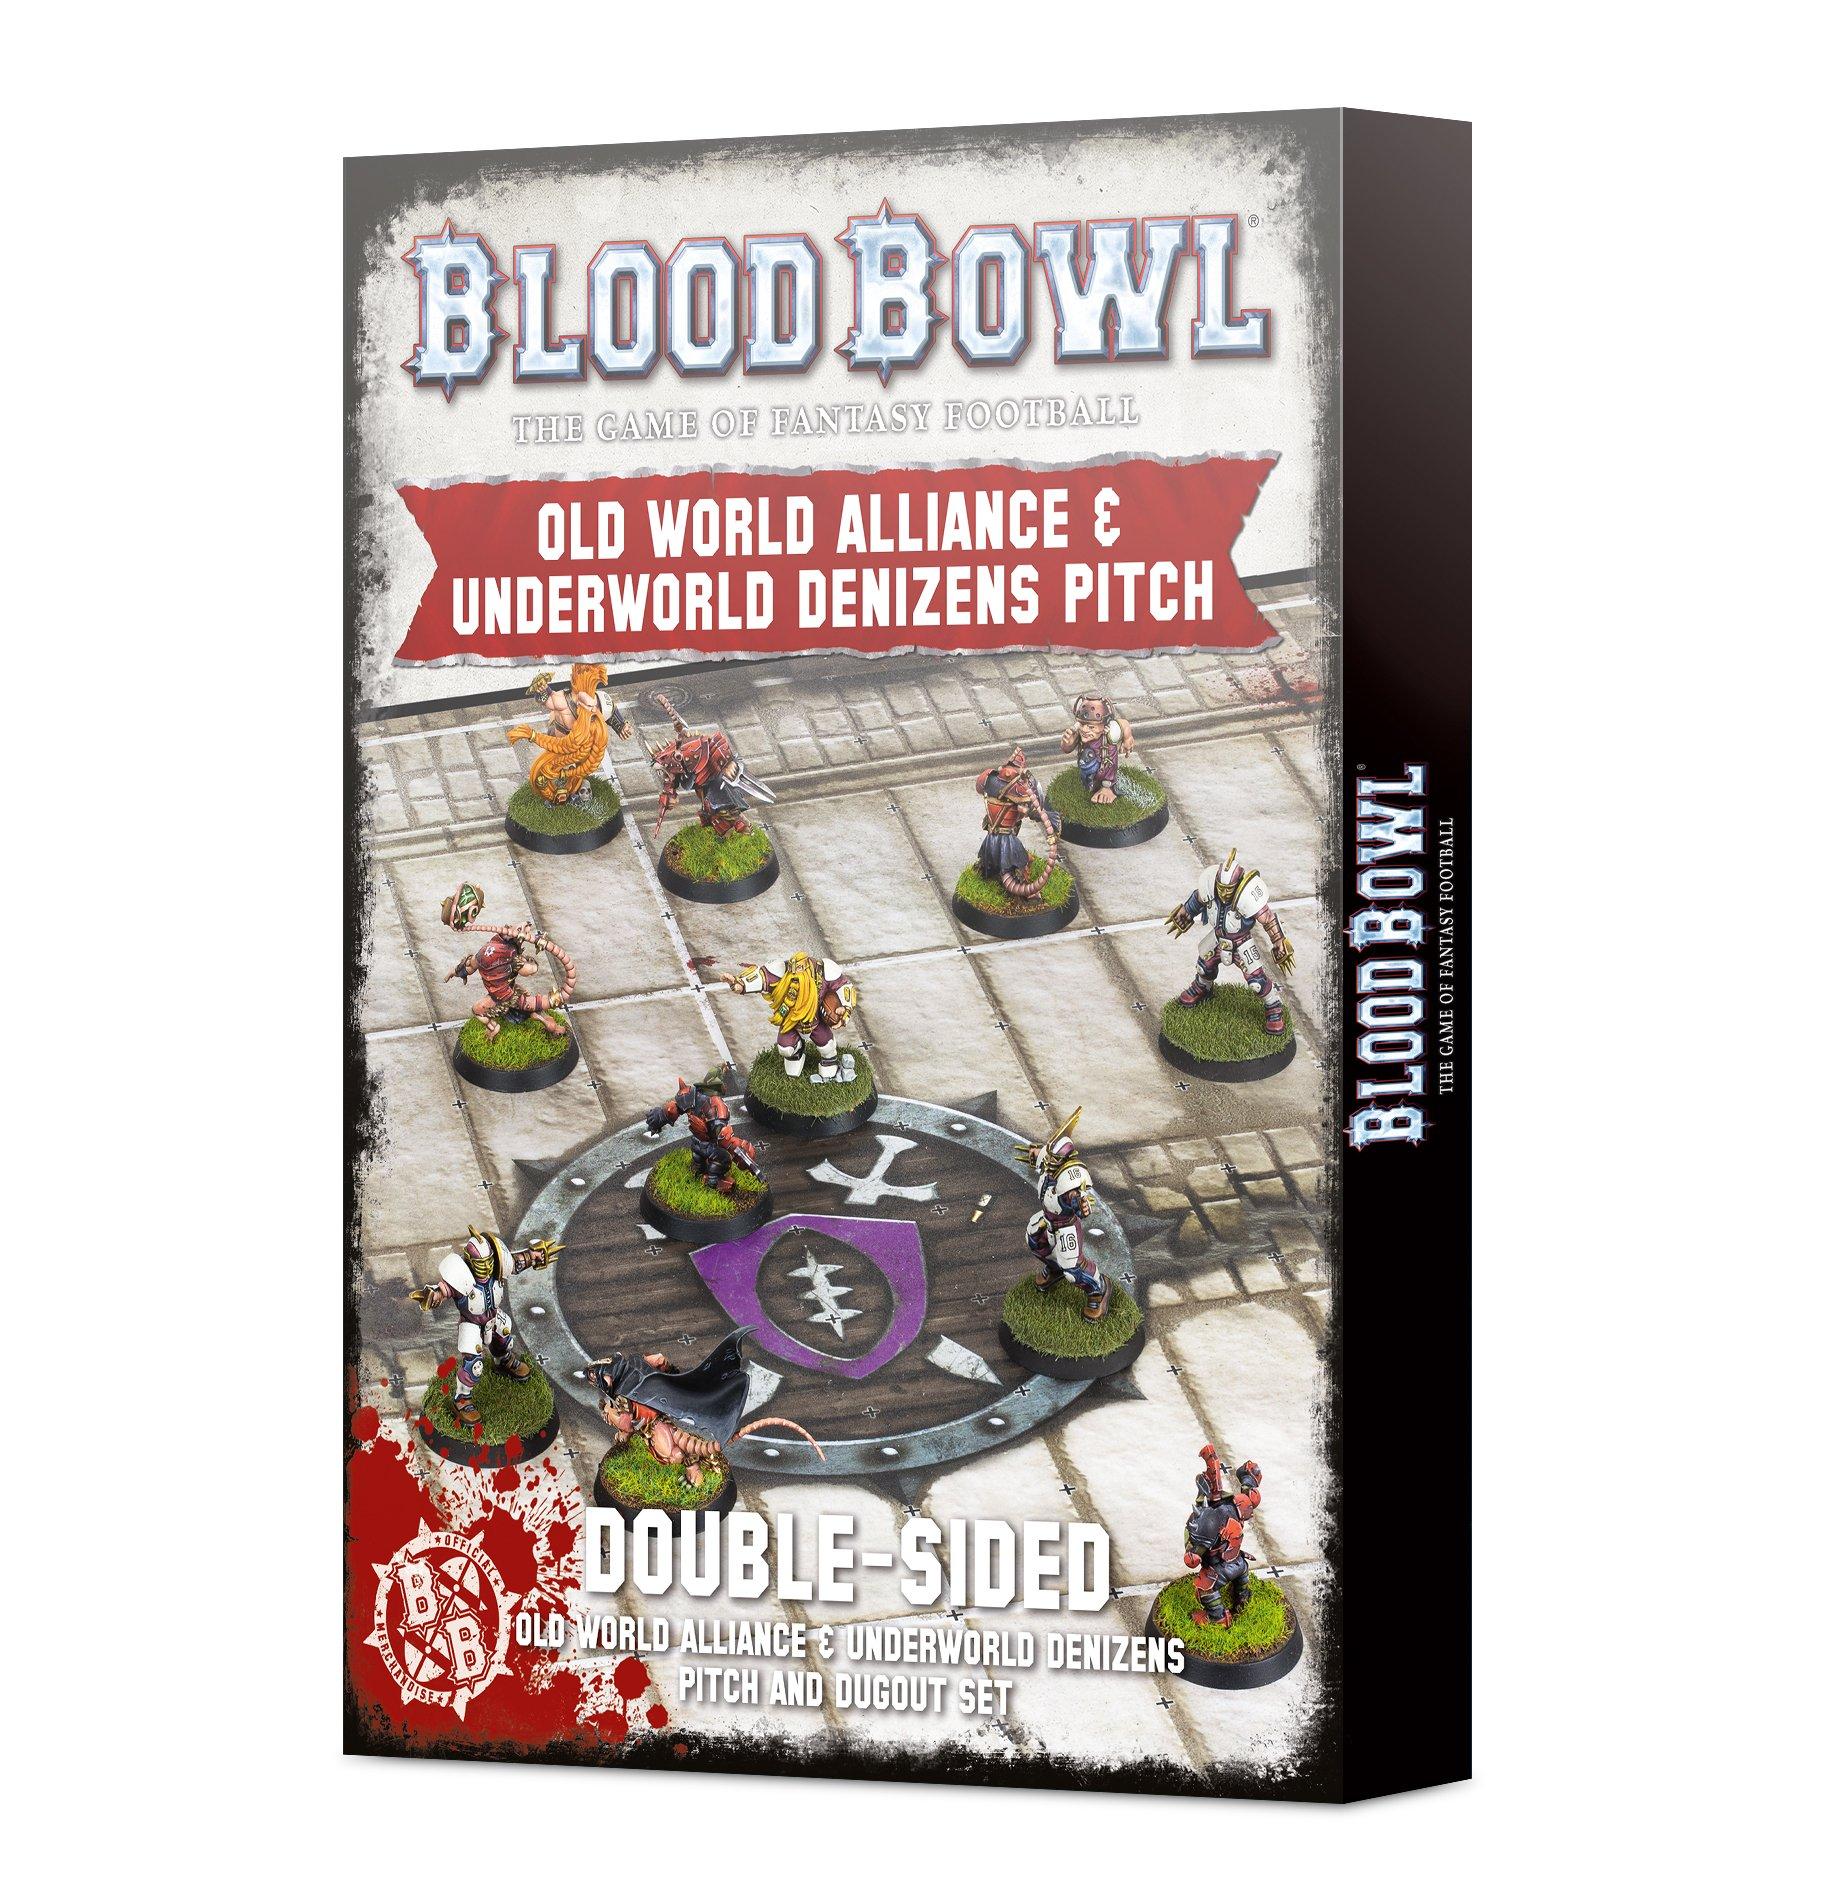 Old World & Underworld Pitch, Blood Bowl